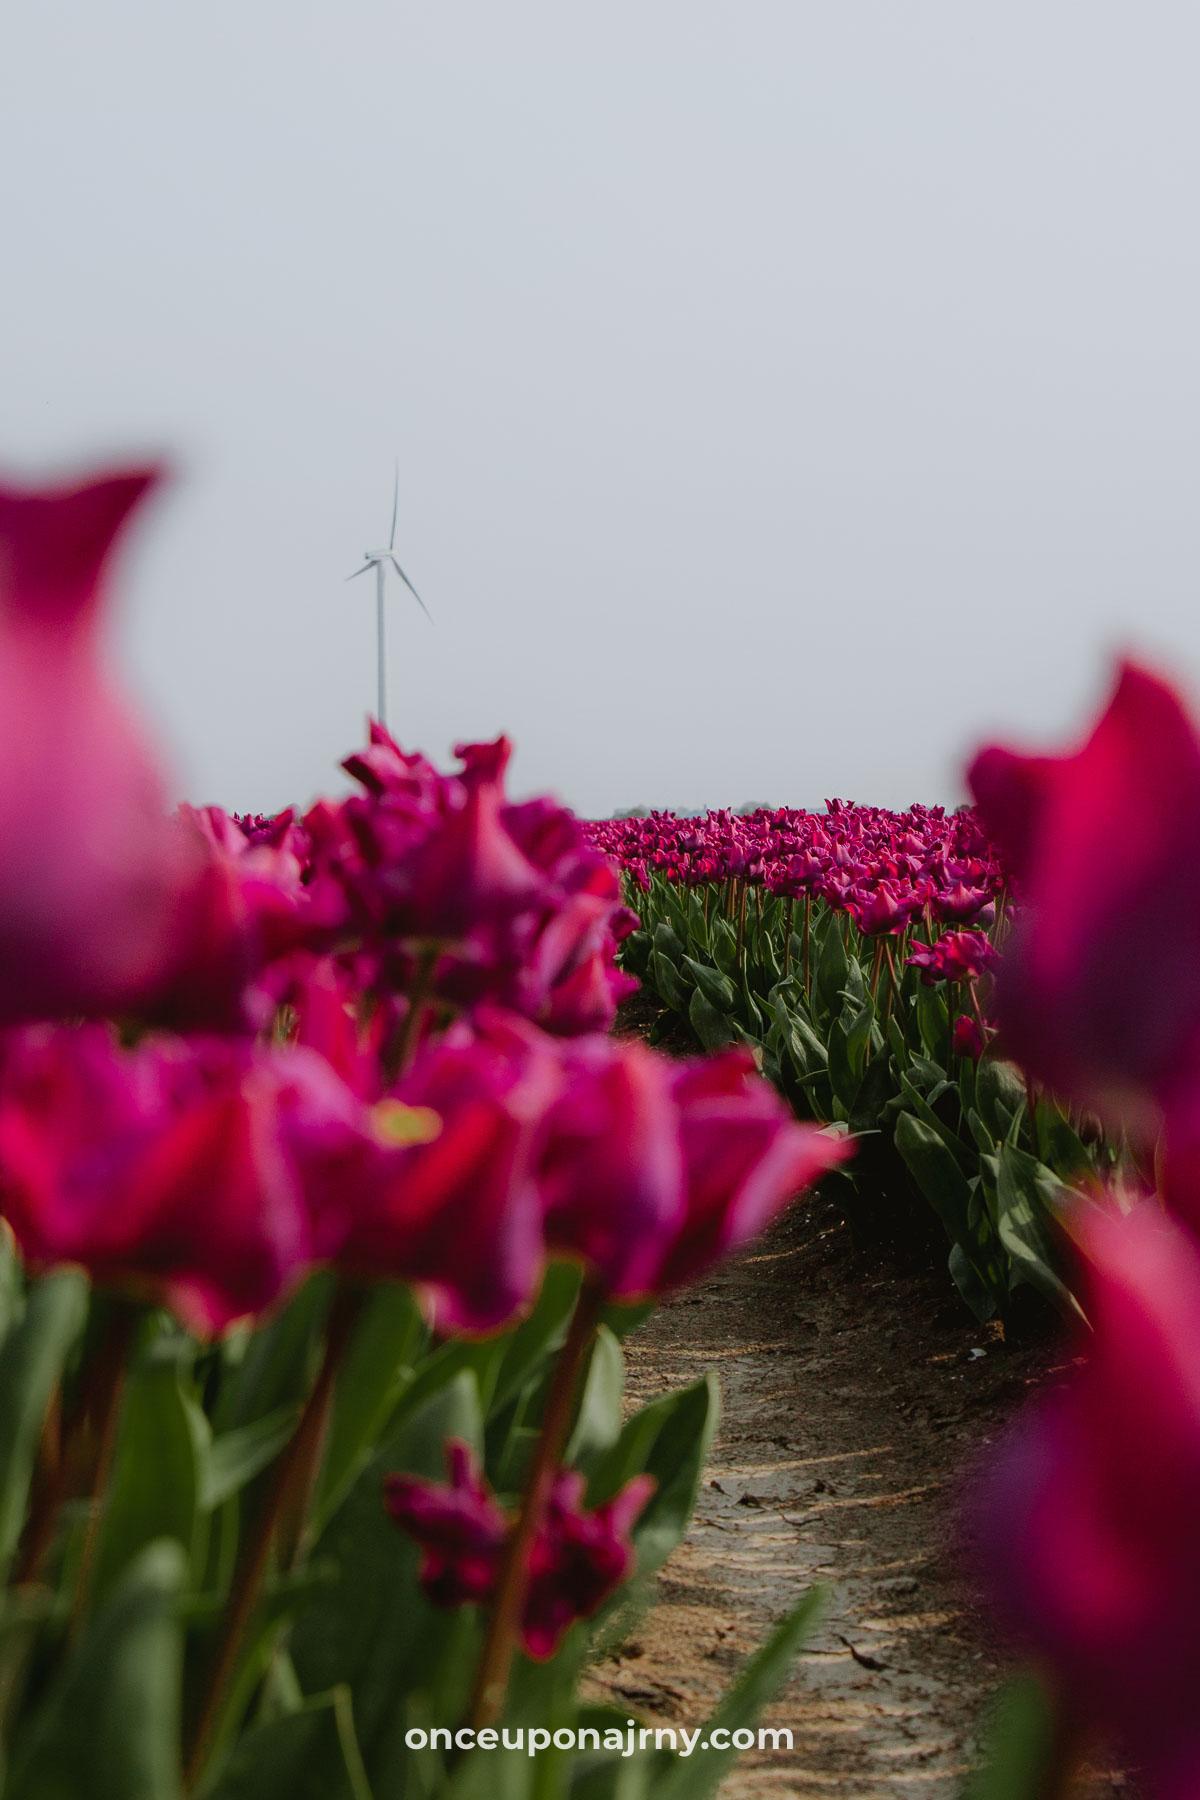 Paarse tulpenvelden windmolen Flevoland Zeewolde